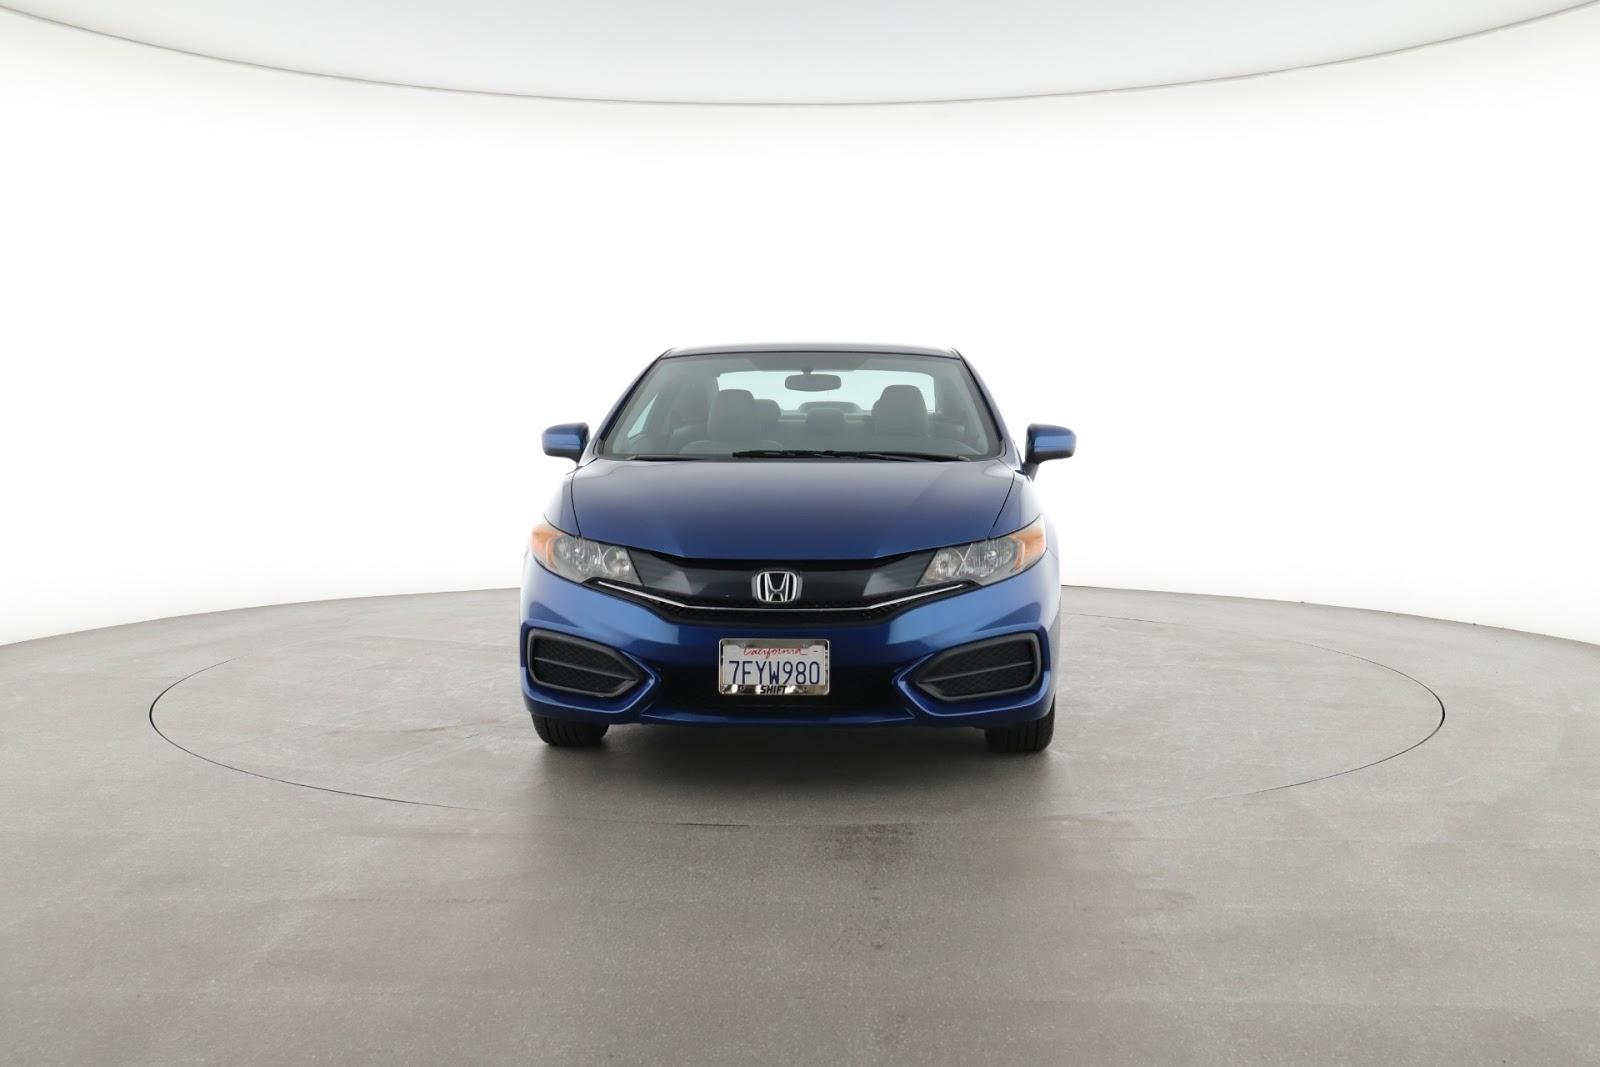 2014 Honda Civic LX W (from $9,950)